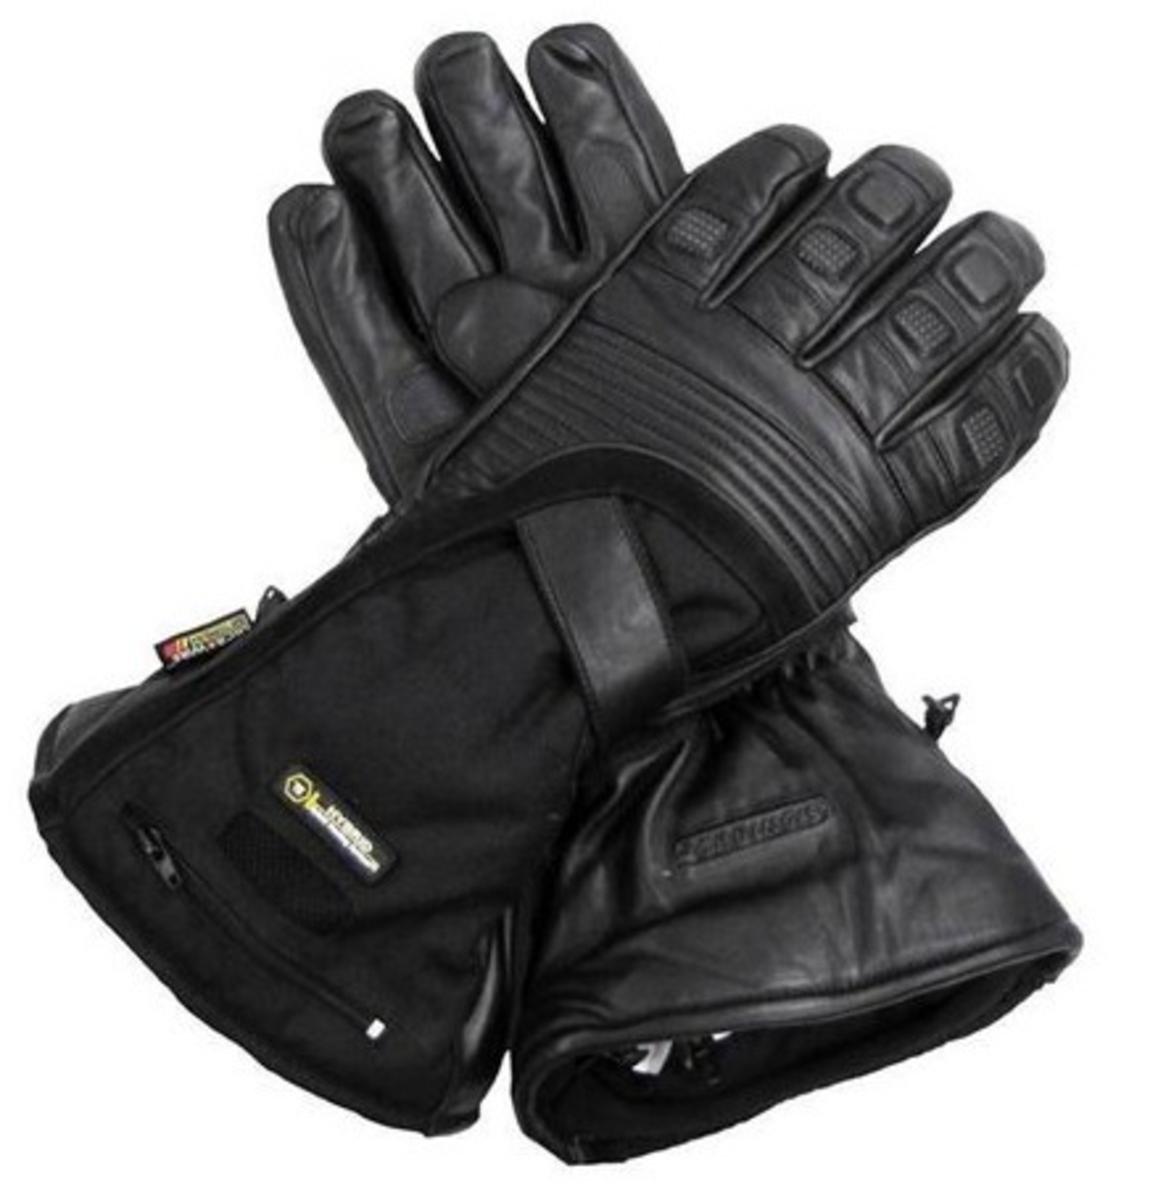 Leather gloves mens jd - Leather Gloves Mens Jd